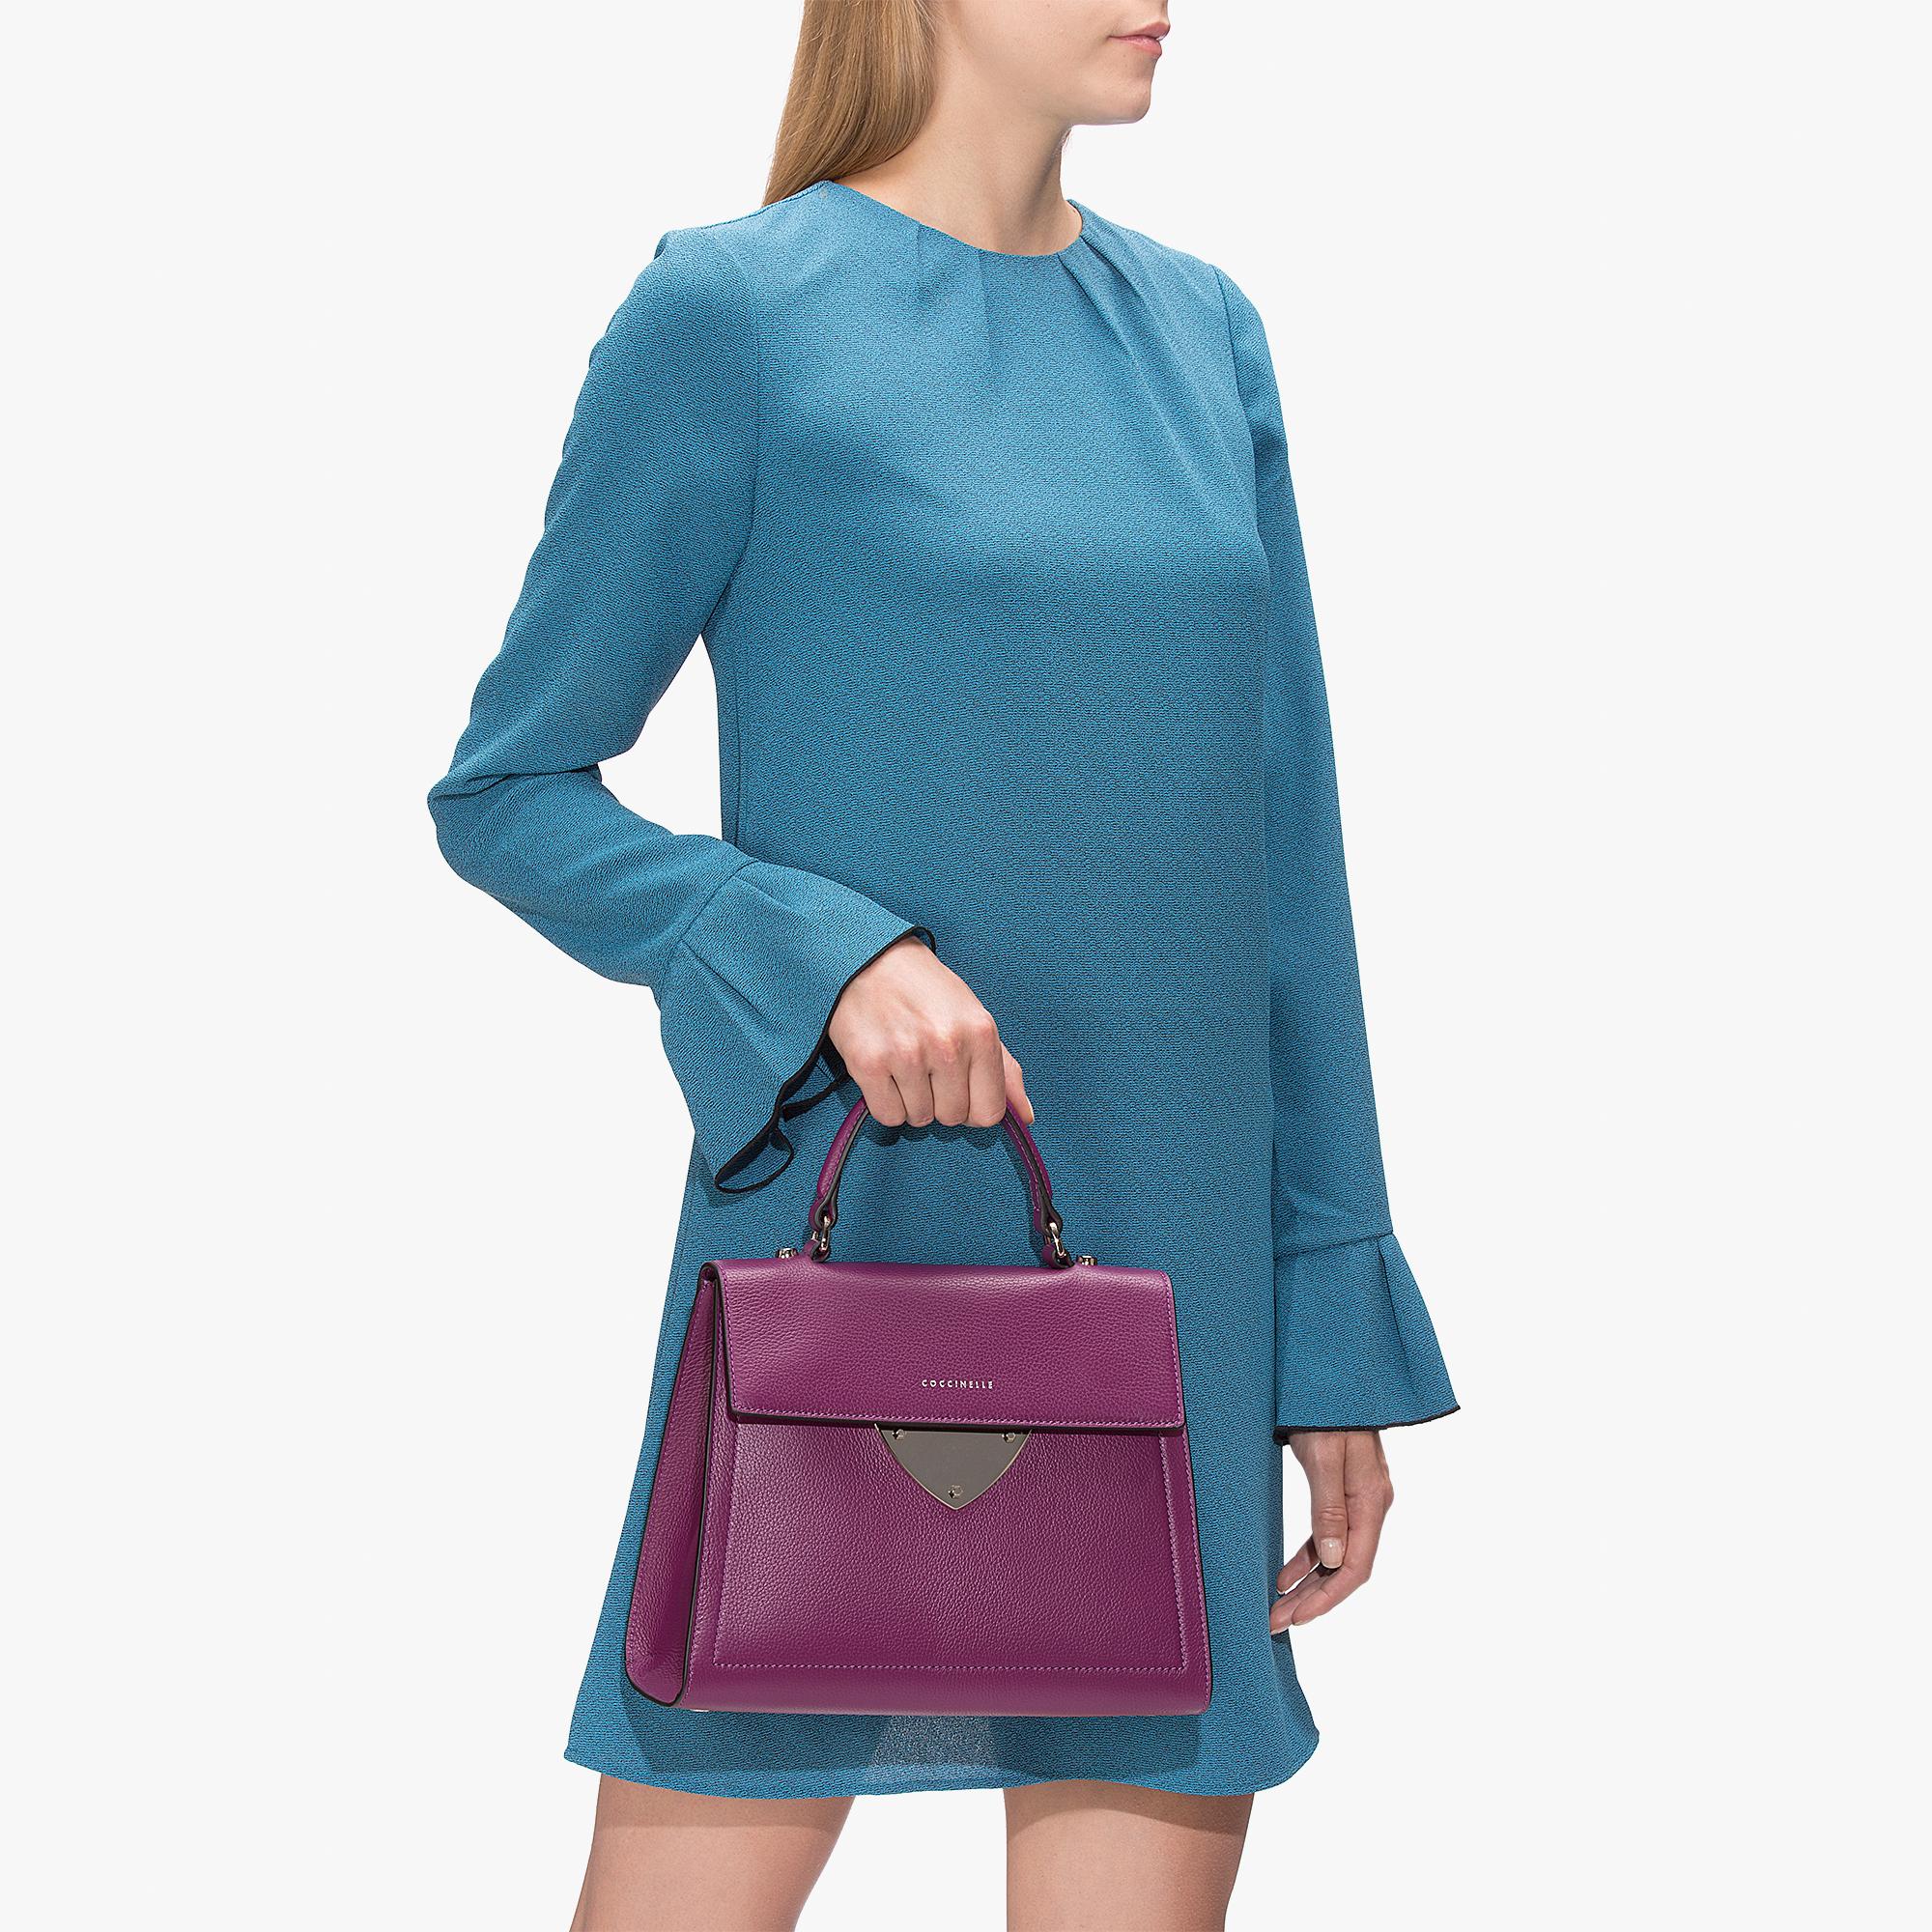 B14 leather handbag